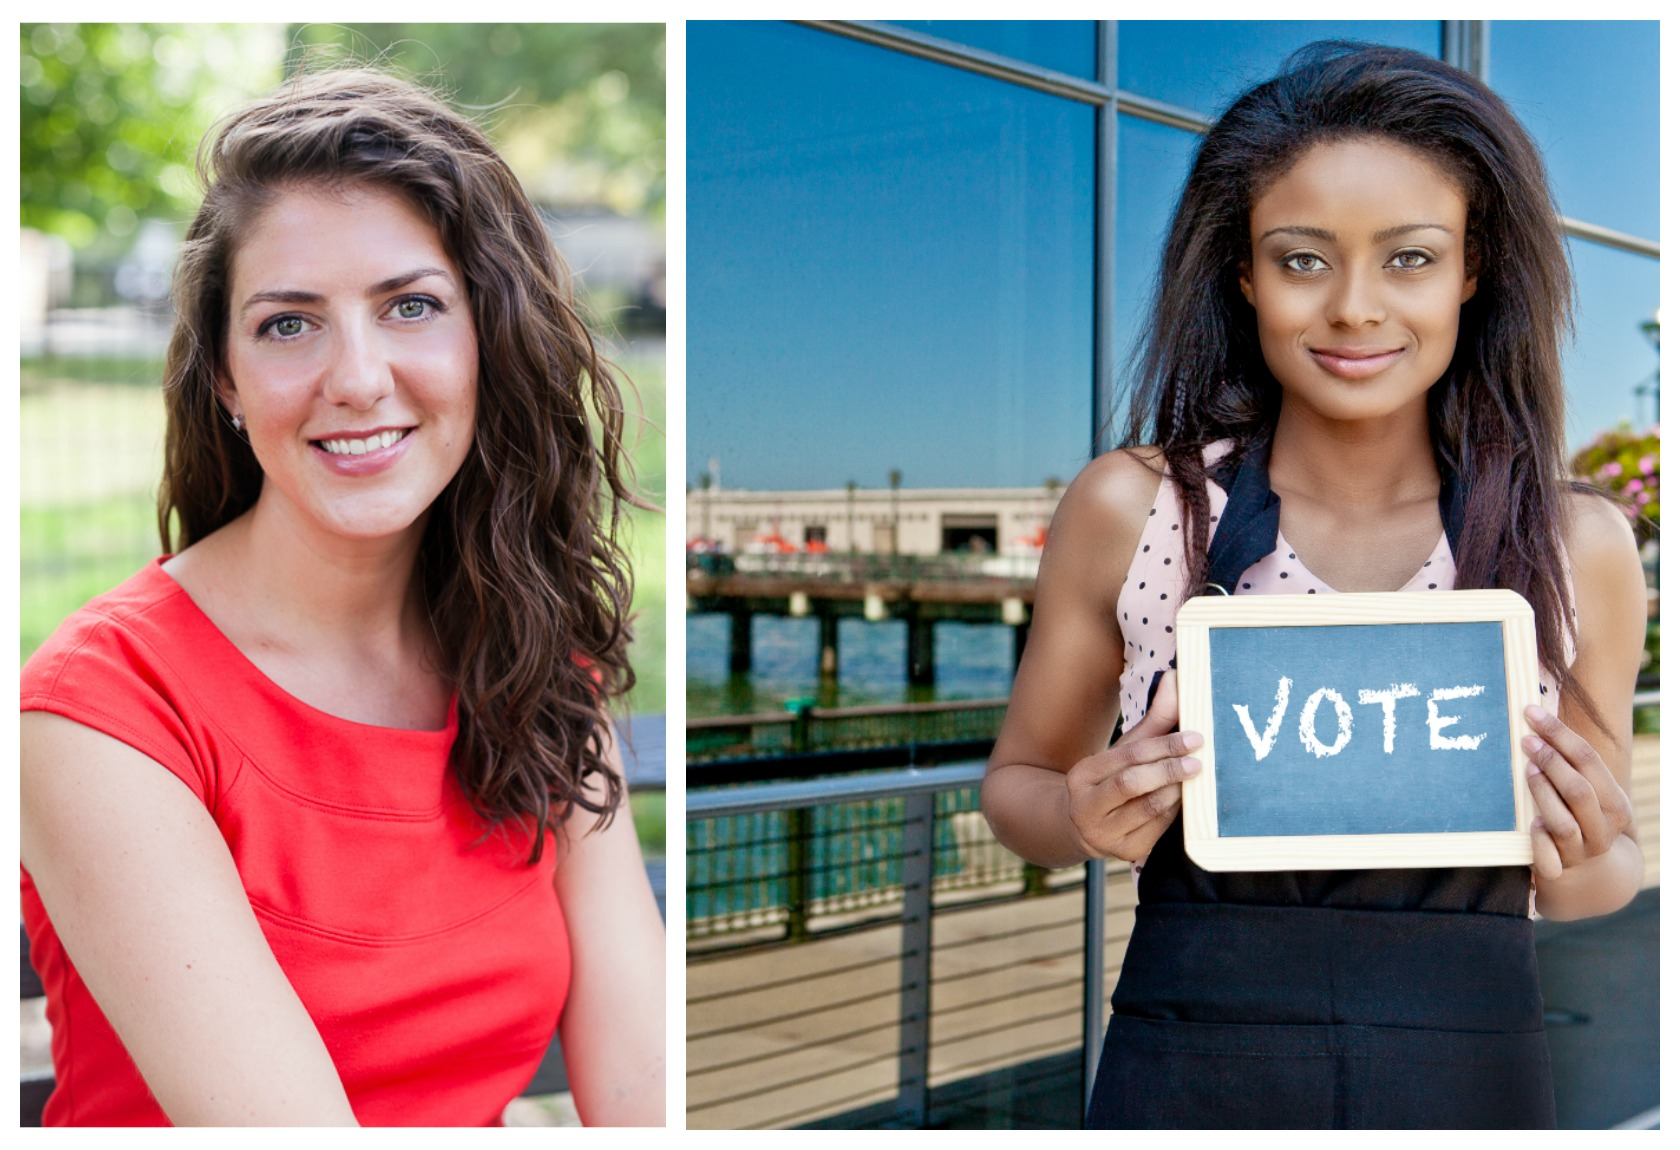 Erin Vilardi / Woman voter